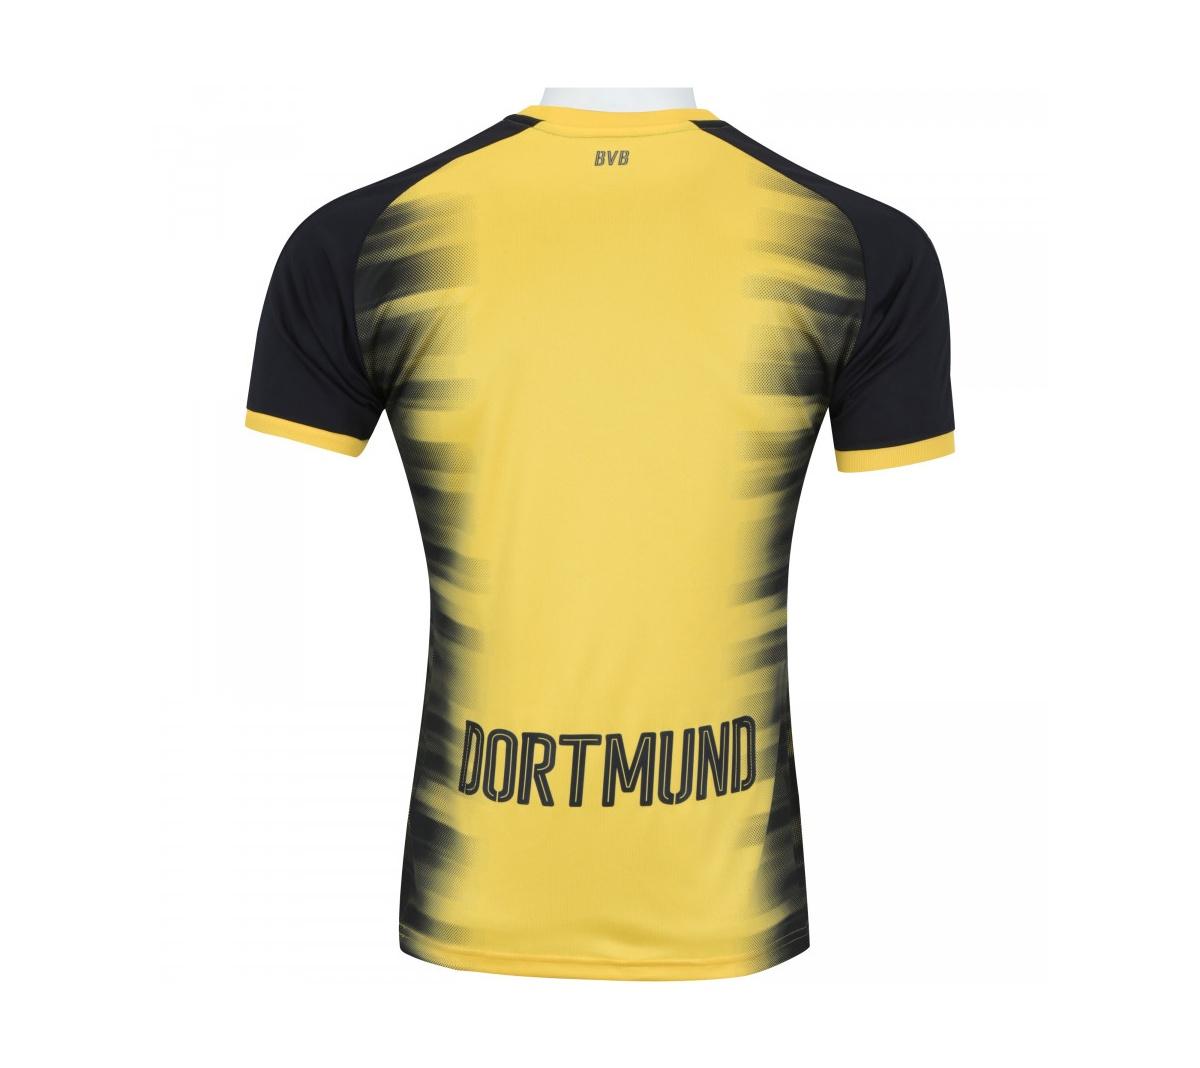 Camisa Puma Borussia Dortmund III Oficial 17/18